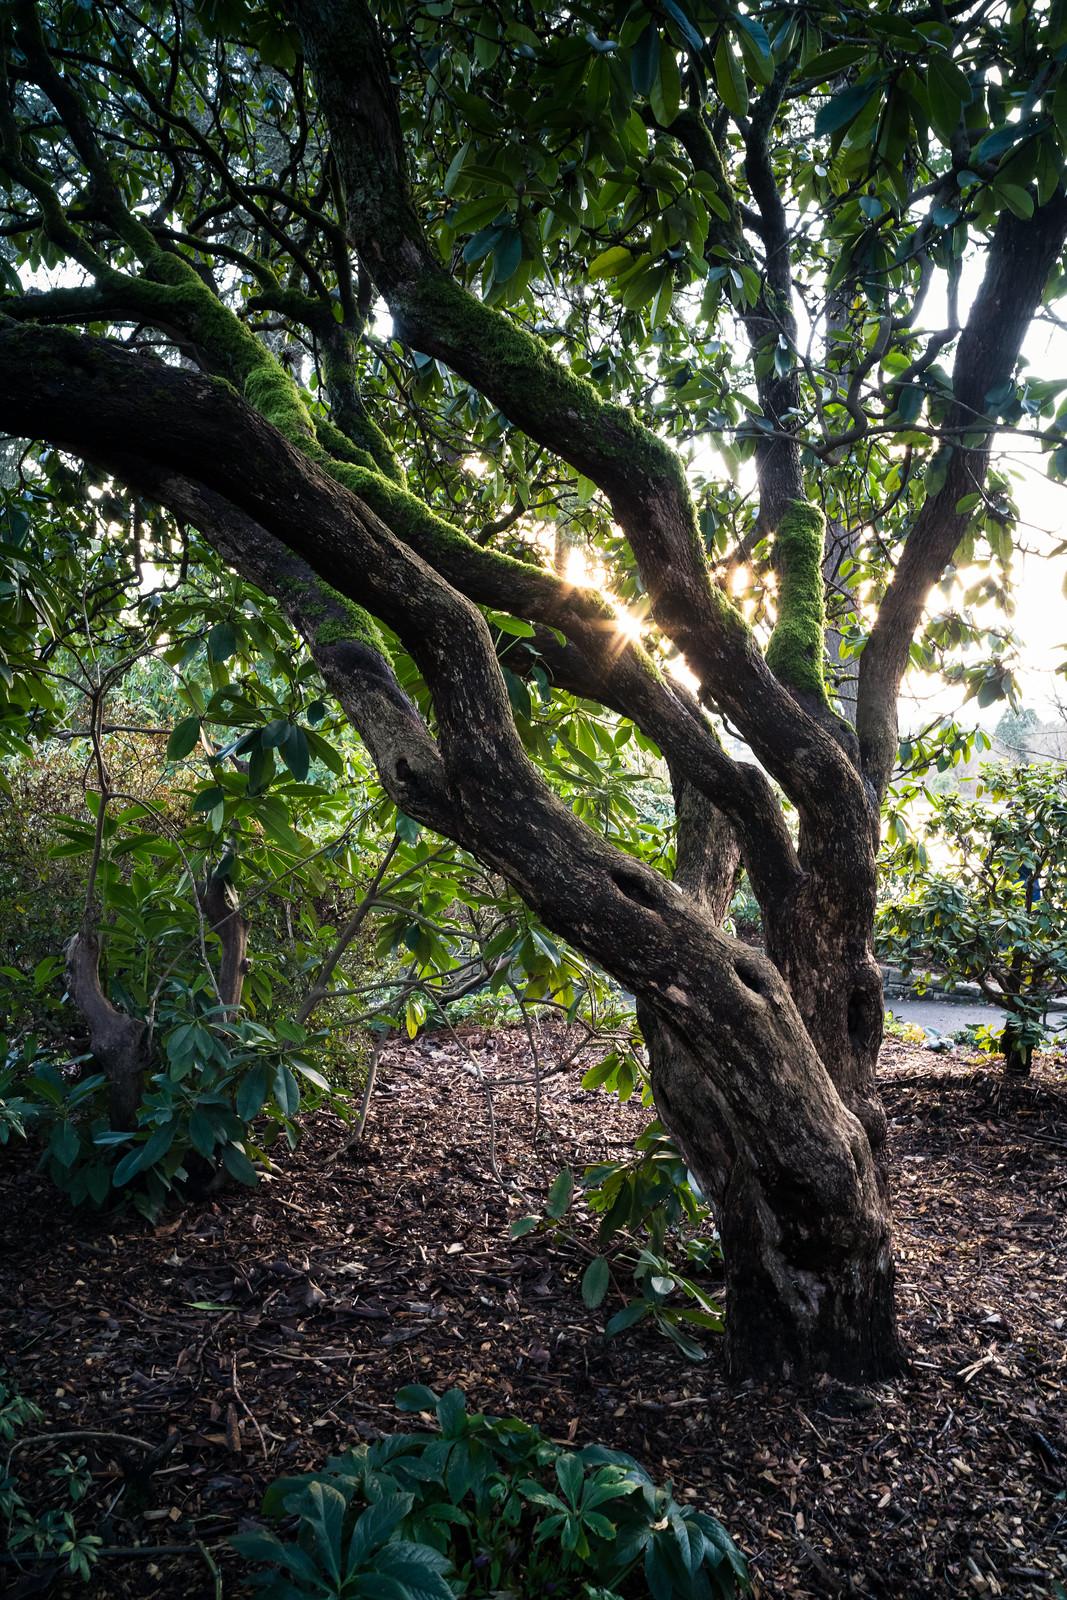 Sony A7RII | Carl Zeiss Contax G 28mm f/2.8 Biogon + 1.5m PCX | f/11